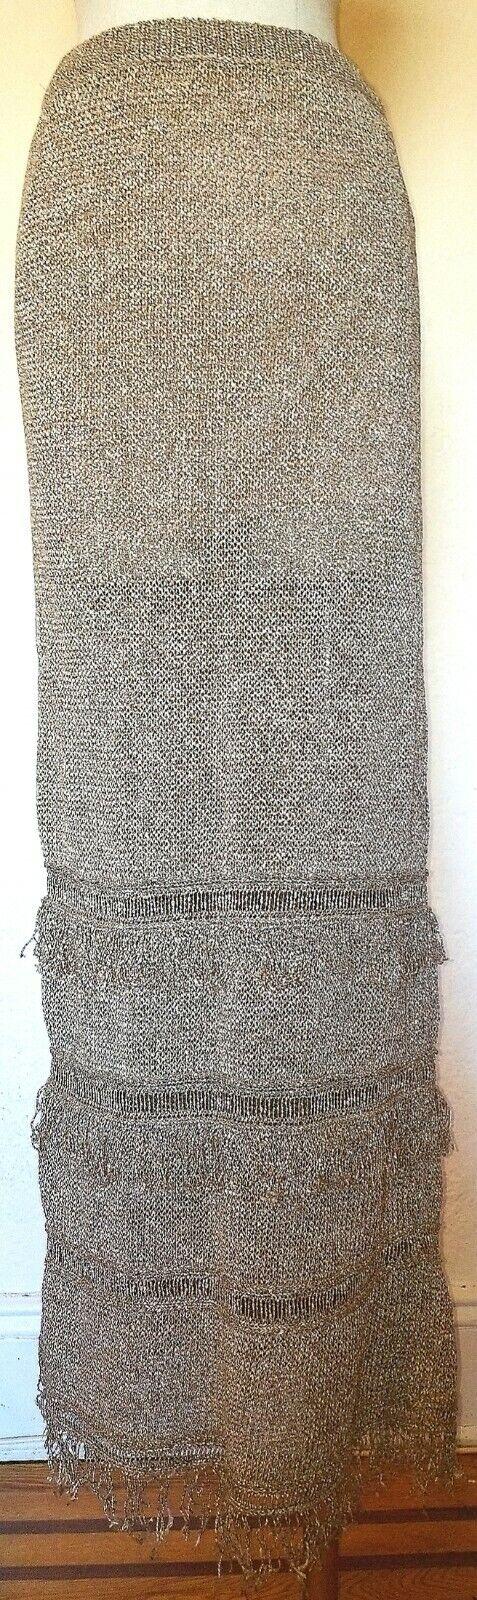 Rachel Zoe Brown Knit Fringe Maxi Skirt Size XS